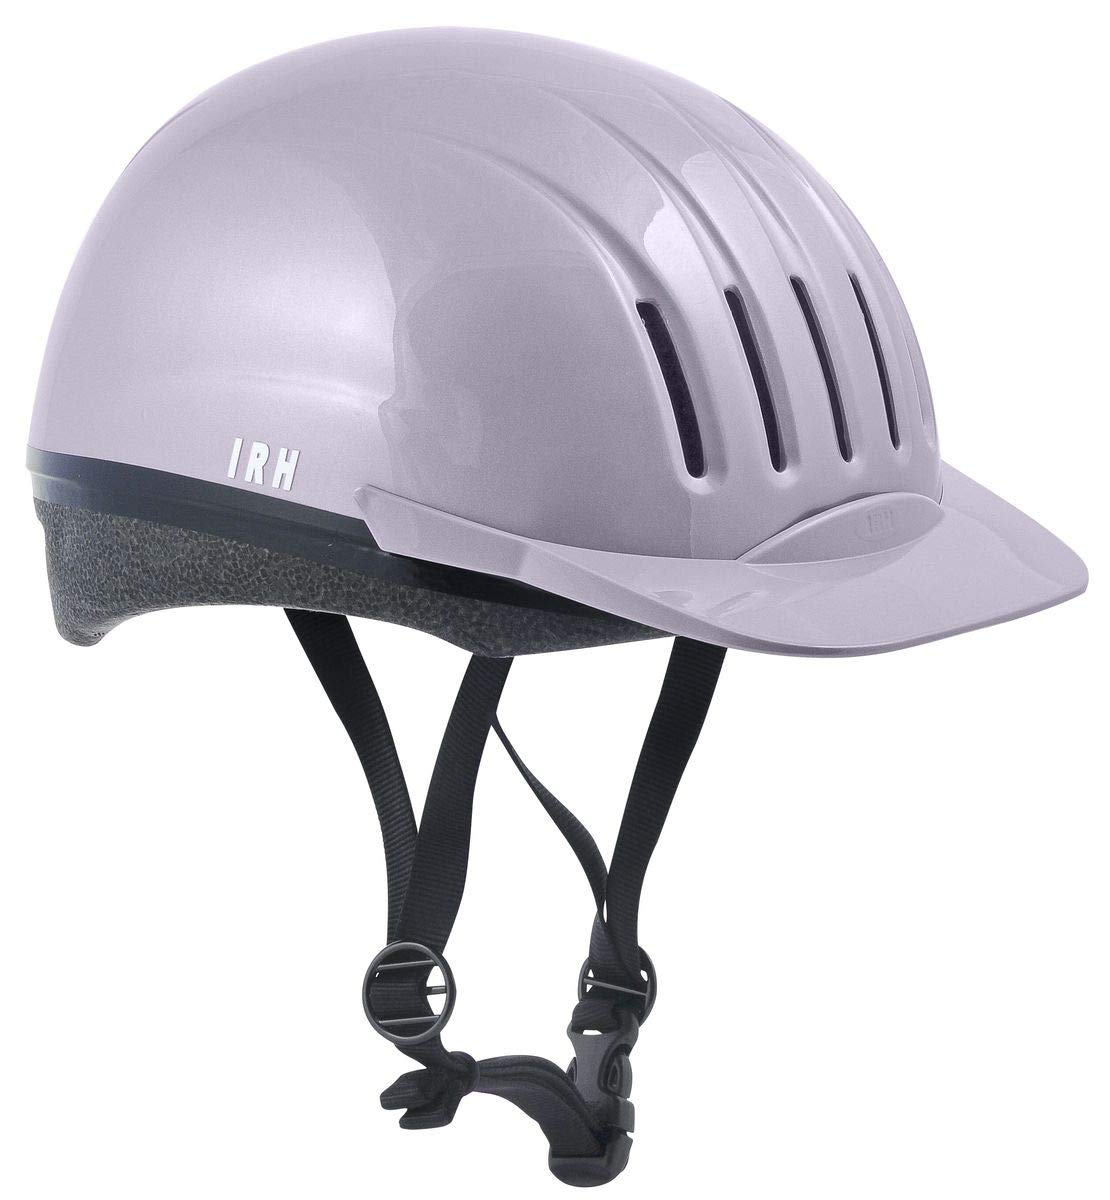 IRH INTERNATIONAL RIDING HELMETS Ultra-Lite Equi-Lite Fashion Color Helmet with Dial-Fit-System, Lavender, Large by IRH INTERNATIONAL RIDING HELMETS